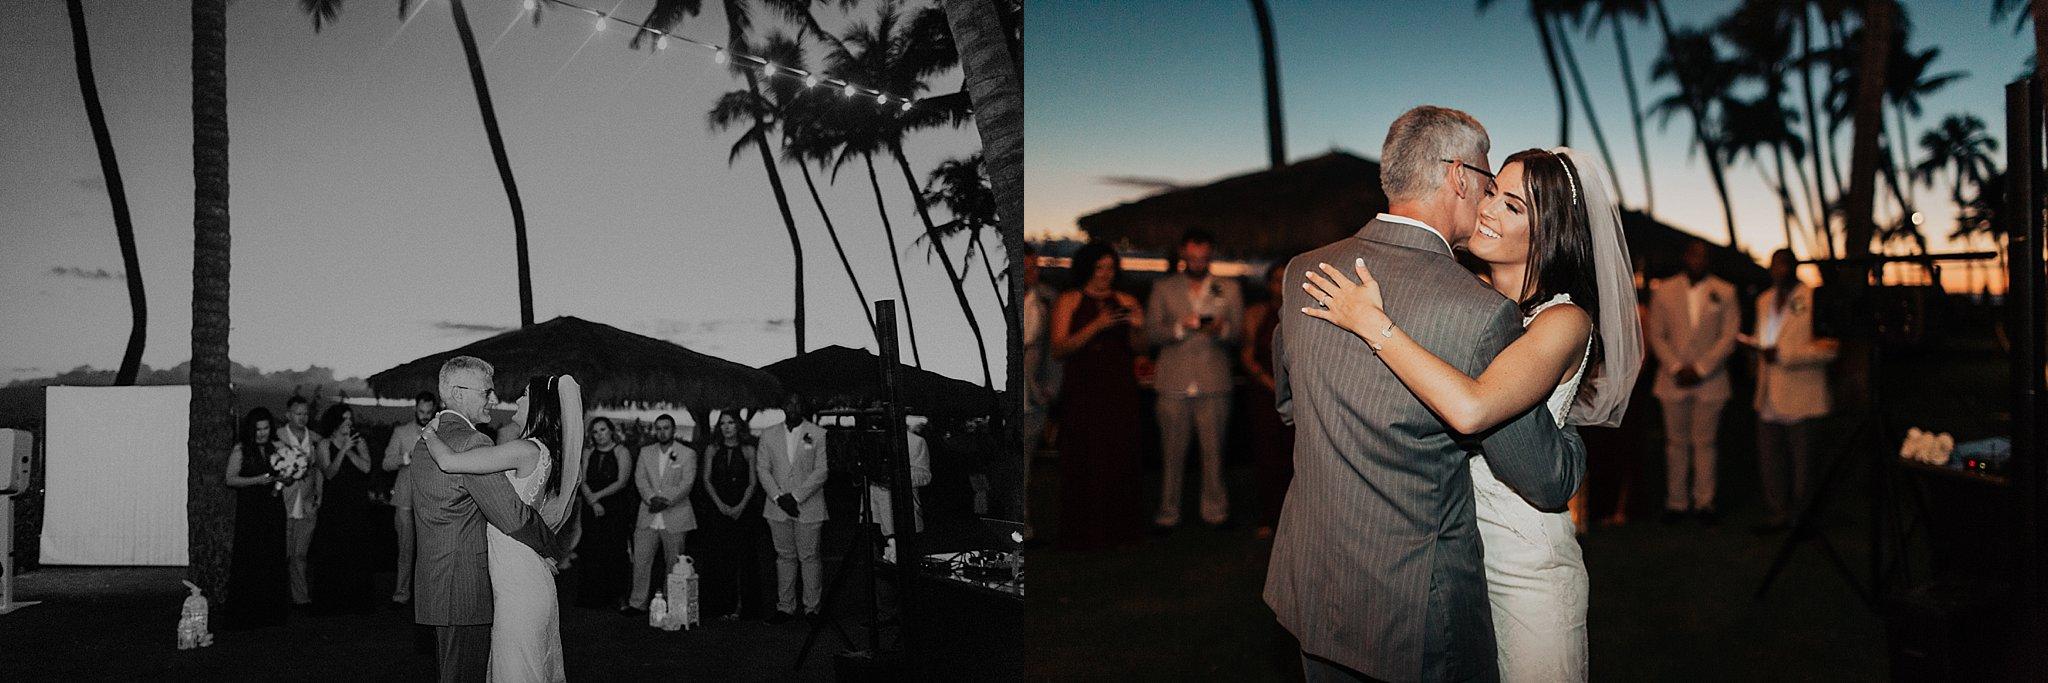 samantha_mcfarlen_bellingham_washington_engagement_photography_seattle_wedding_photographer_0249.jpg